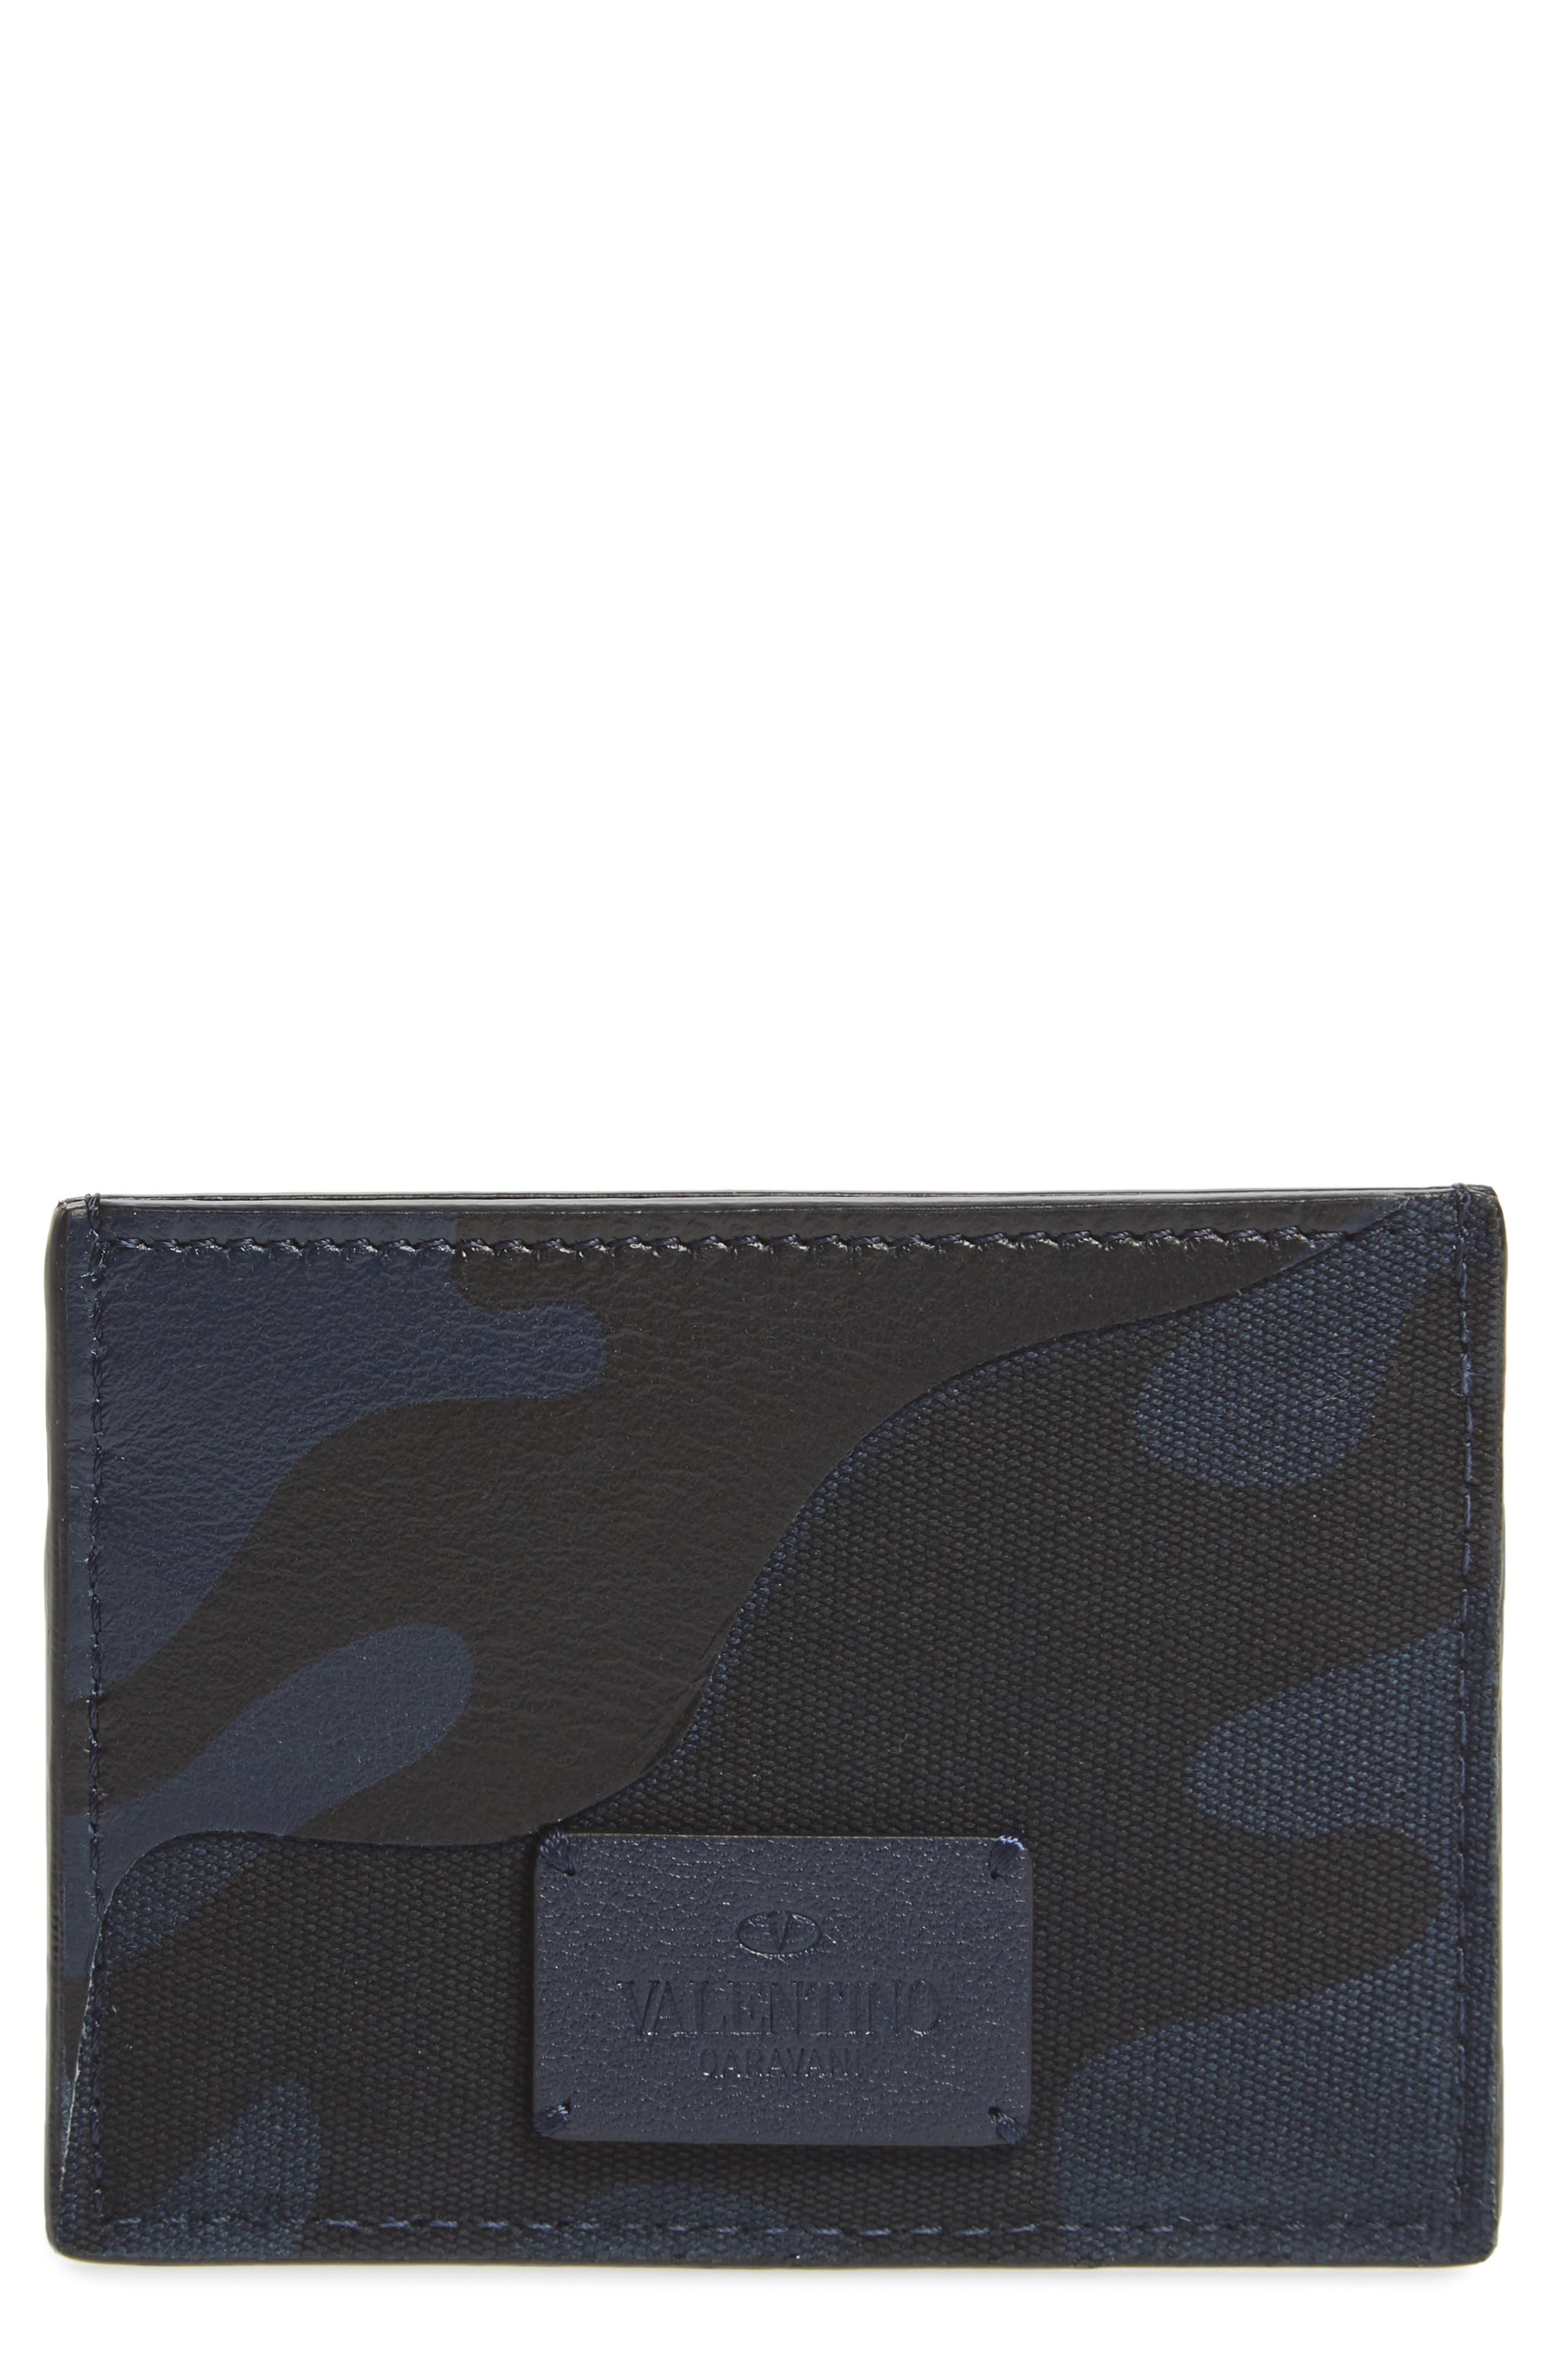 Alternate Image 1 Selected - VALENTINO GARAVANI Camo Nylon & Leather Card Case